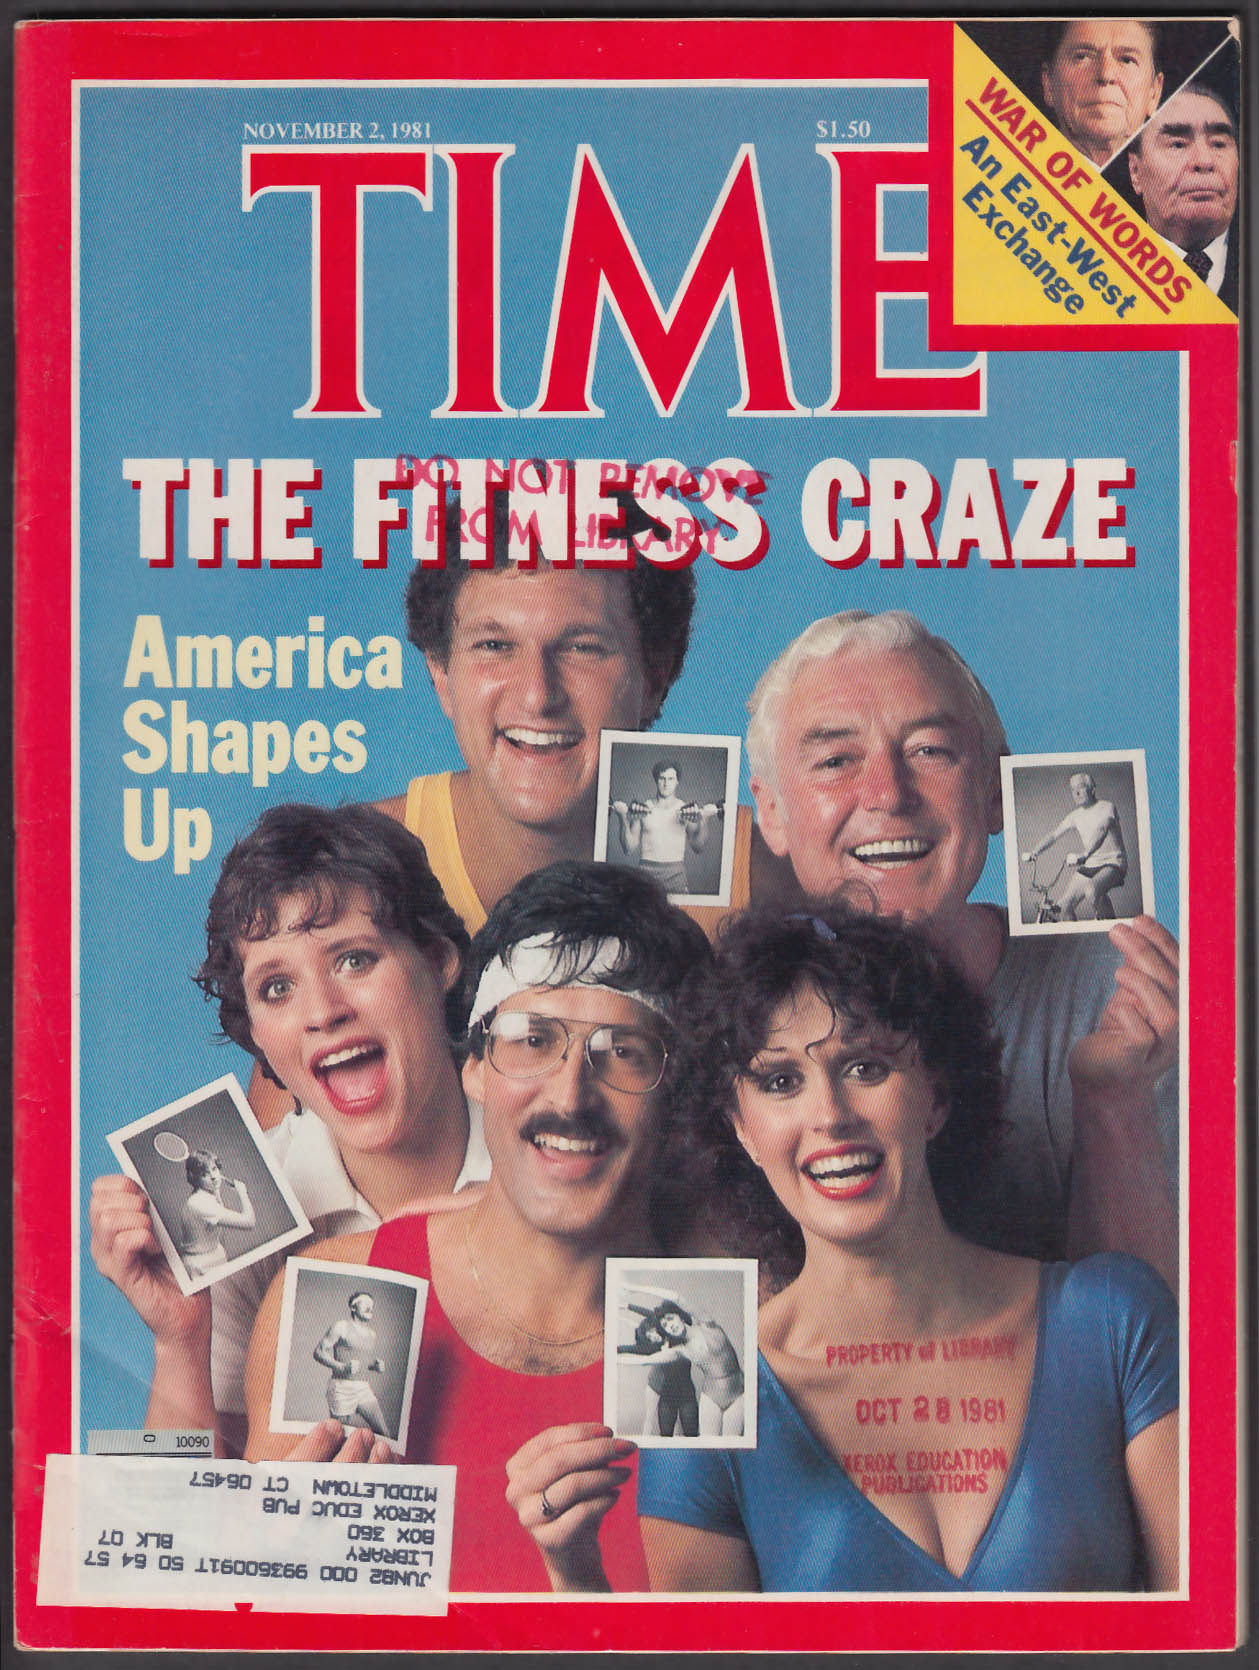 TIME Fitness Aerobics Jazzercise Ronald Reagan Brezhnev + 11/2 1981